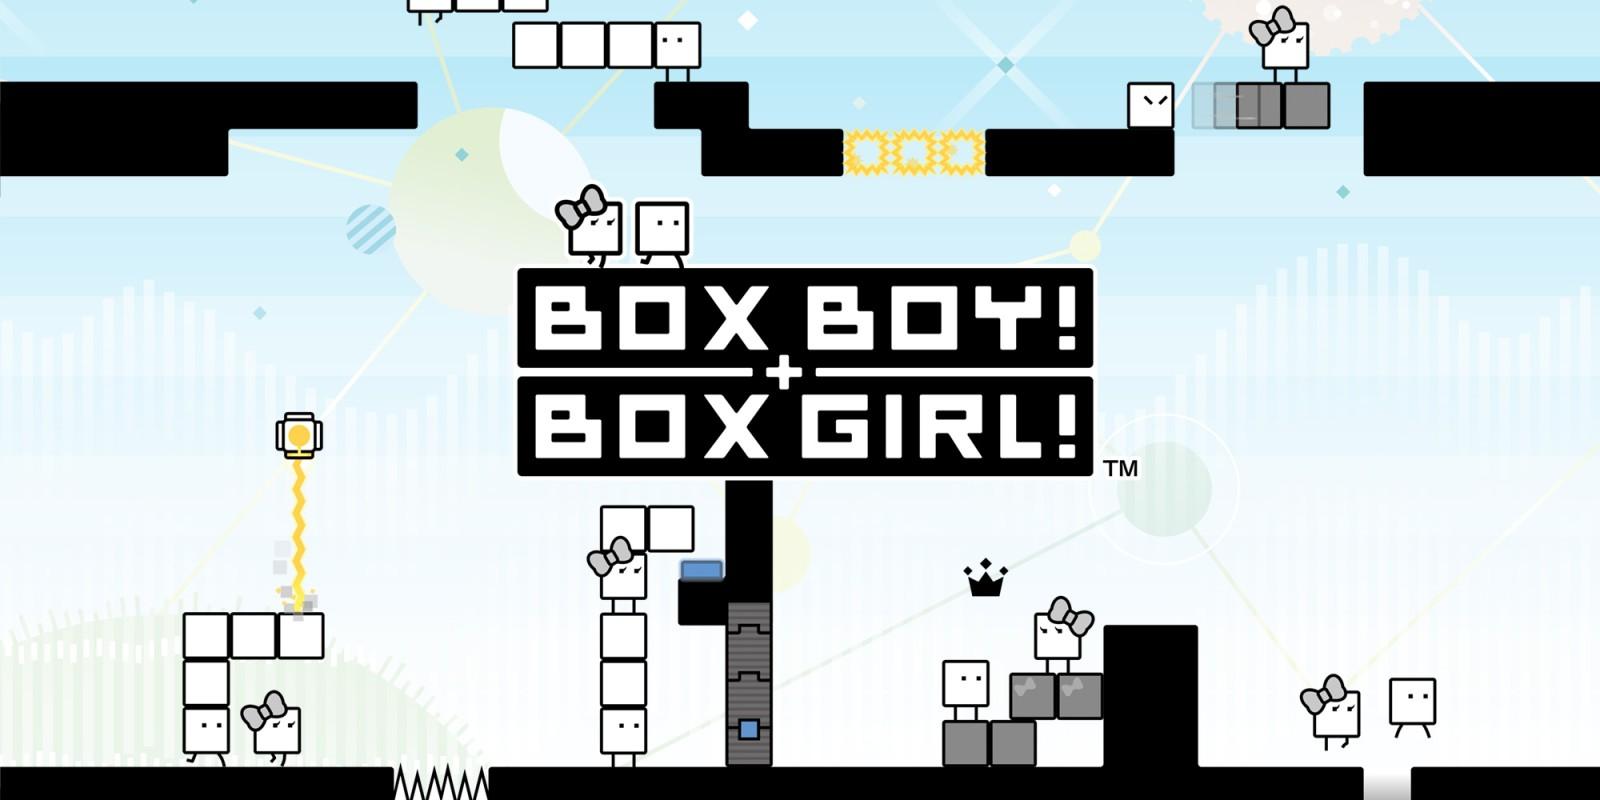 Resultado de imagen de portada videojuego Box Boy! + Box Girl! nintendo switch